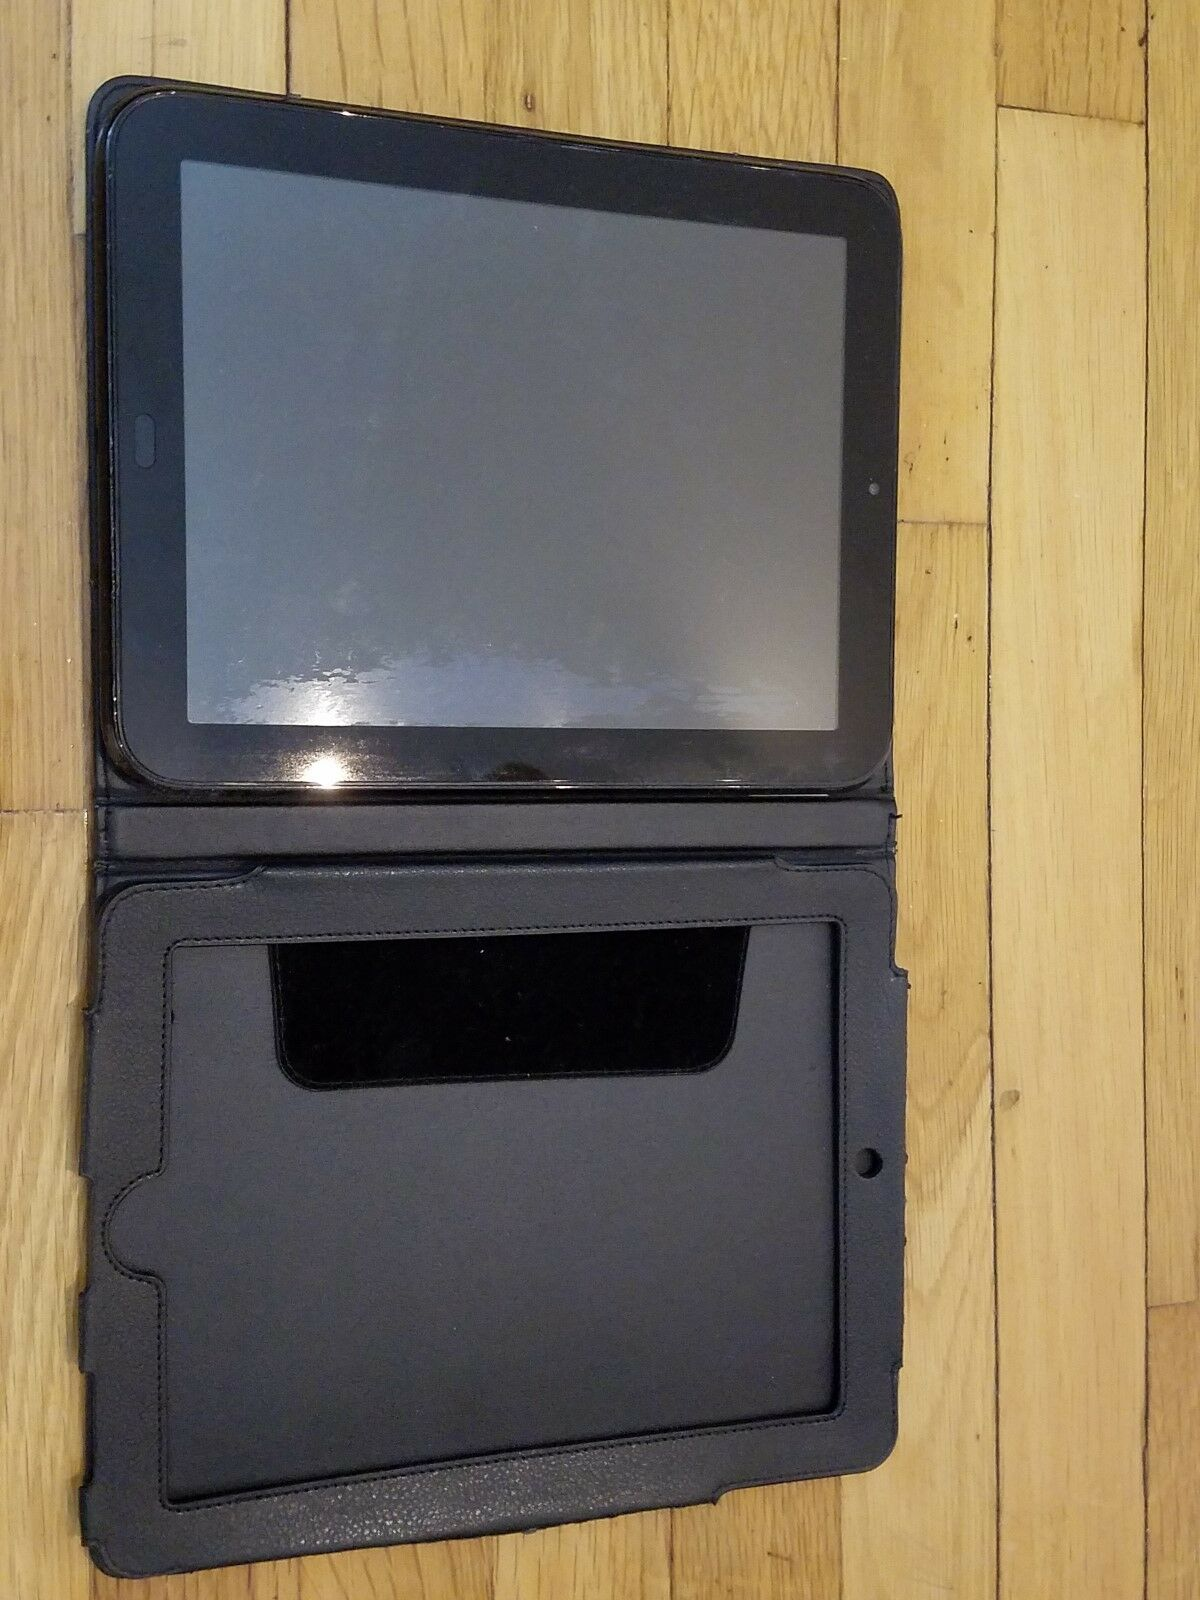 HP TouchPad FB355UA 16GB, Wi-Fi, 9.7in - Glossy Black - NOT WORKING